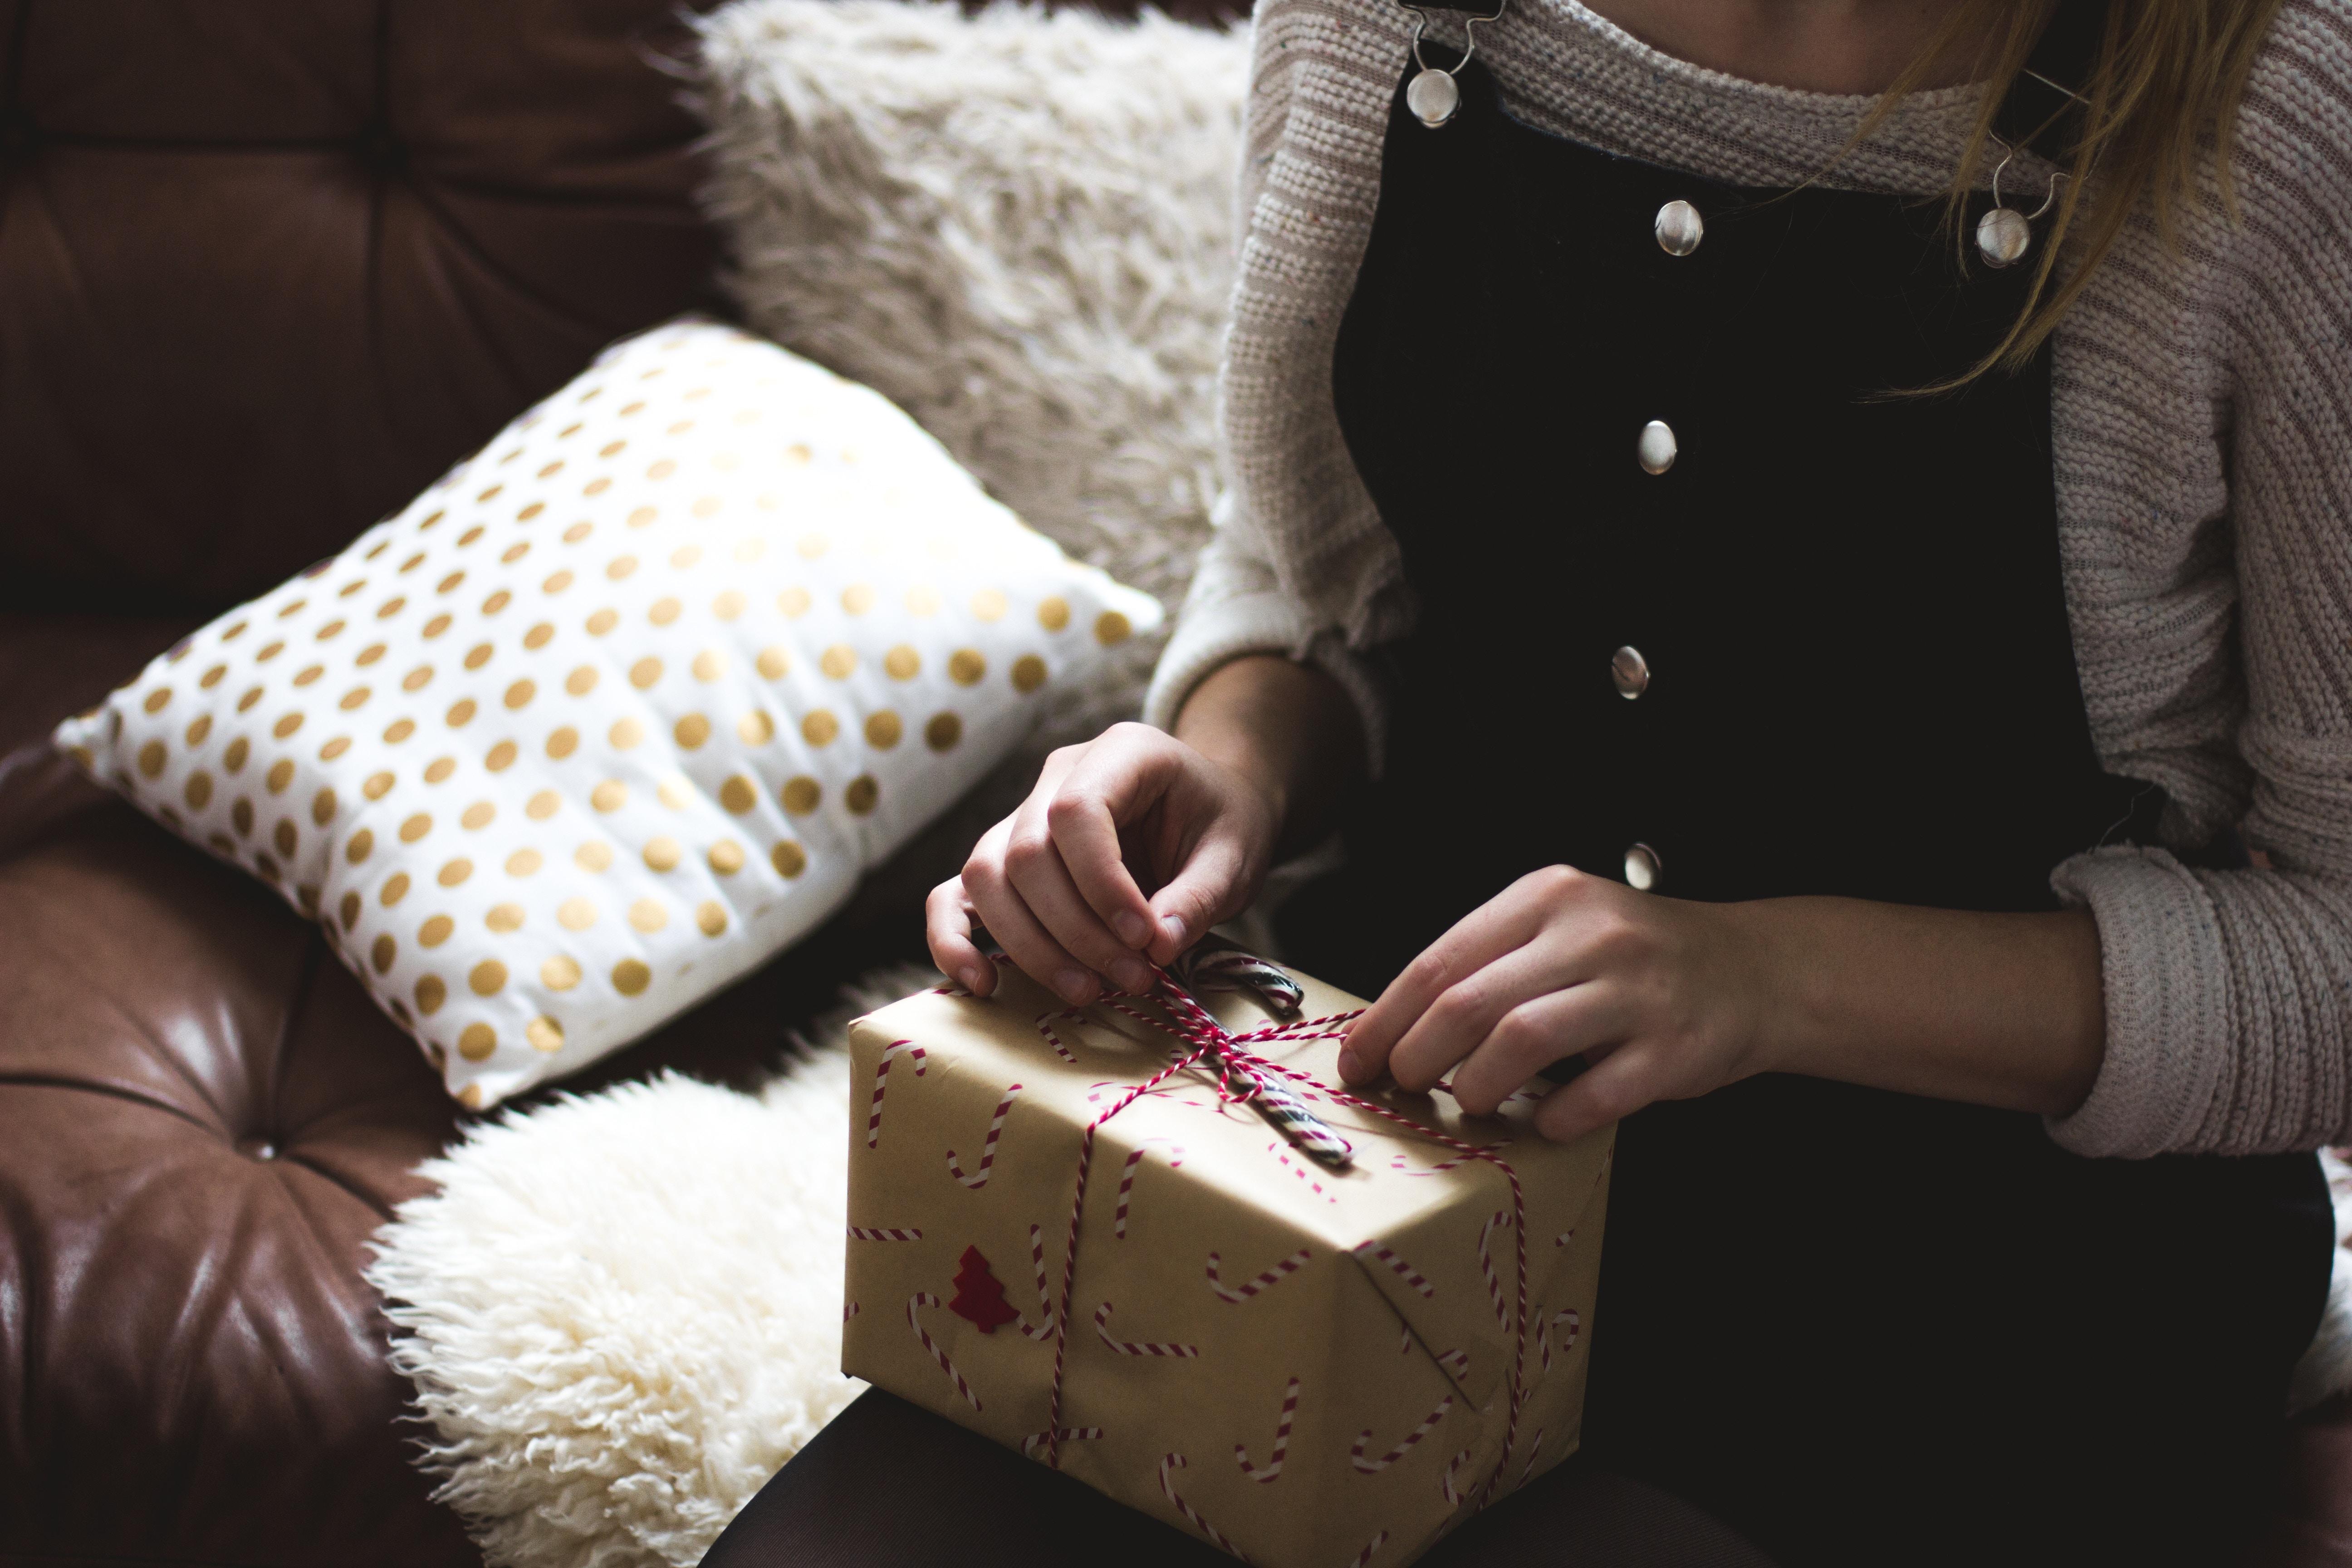 regali di natale 2018 online